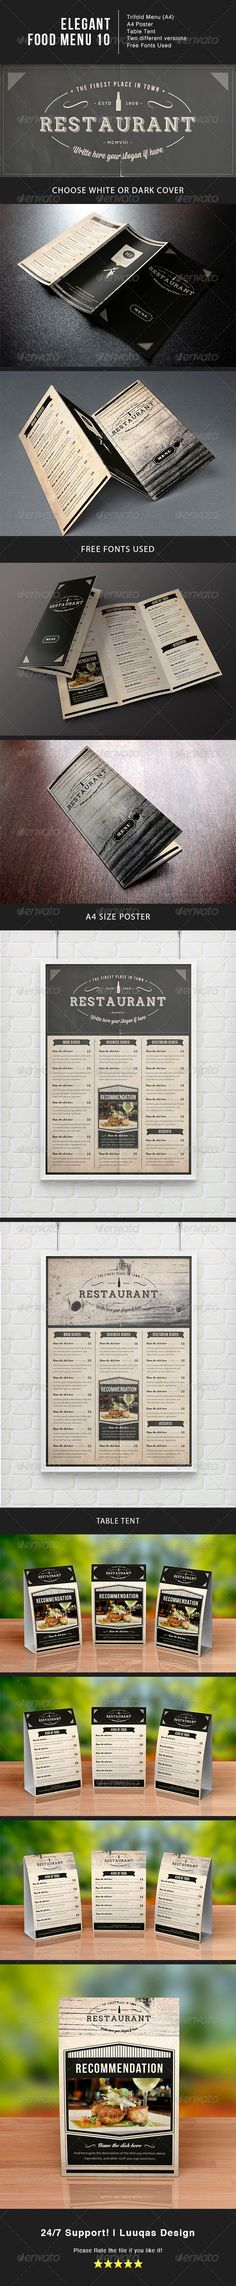 Elegant Food Menu Template #design #speisekarte Download: http://graphicriver.net/item/elegant-food-menu-10/7593439?ref=ksioks